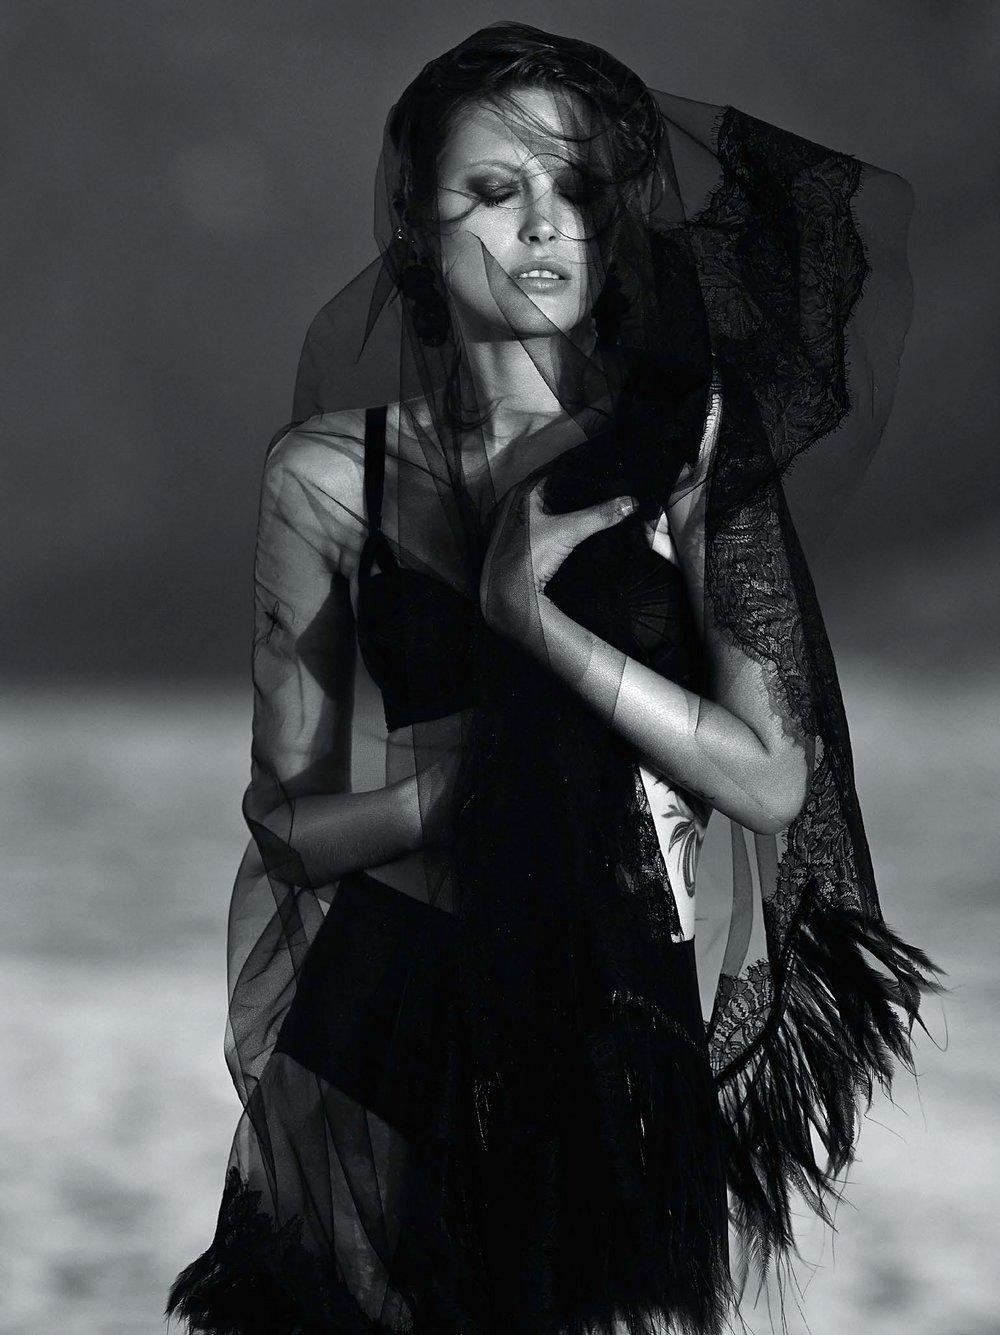 Catherine-McNeil-by-Gilles-Bensimon-for-Vogue-Australia-October-2014-13.jpg